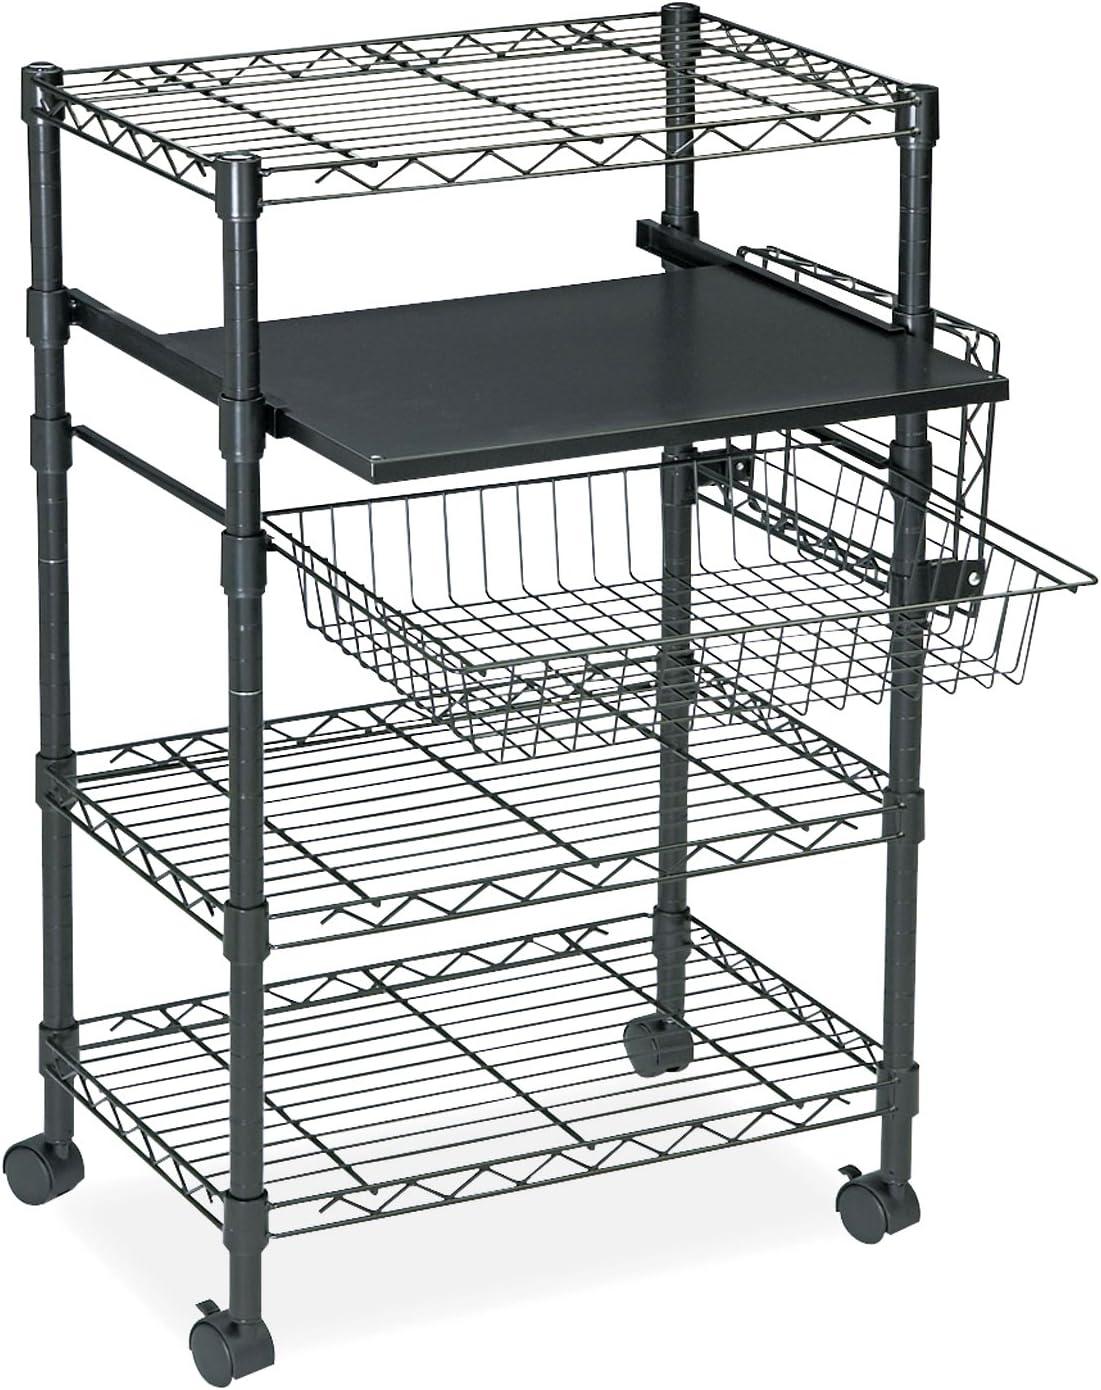 Tiffany Industries Multipurposeose Wire Cart, Three Shelves, 23-1 2W X 15D X 37-1 2H, Black